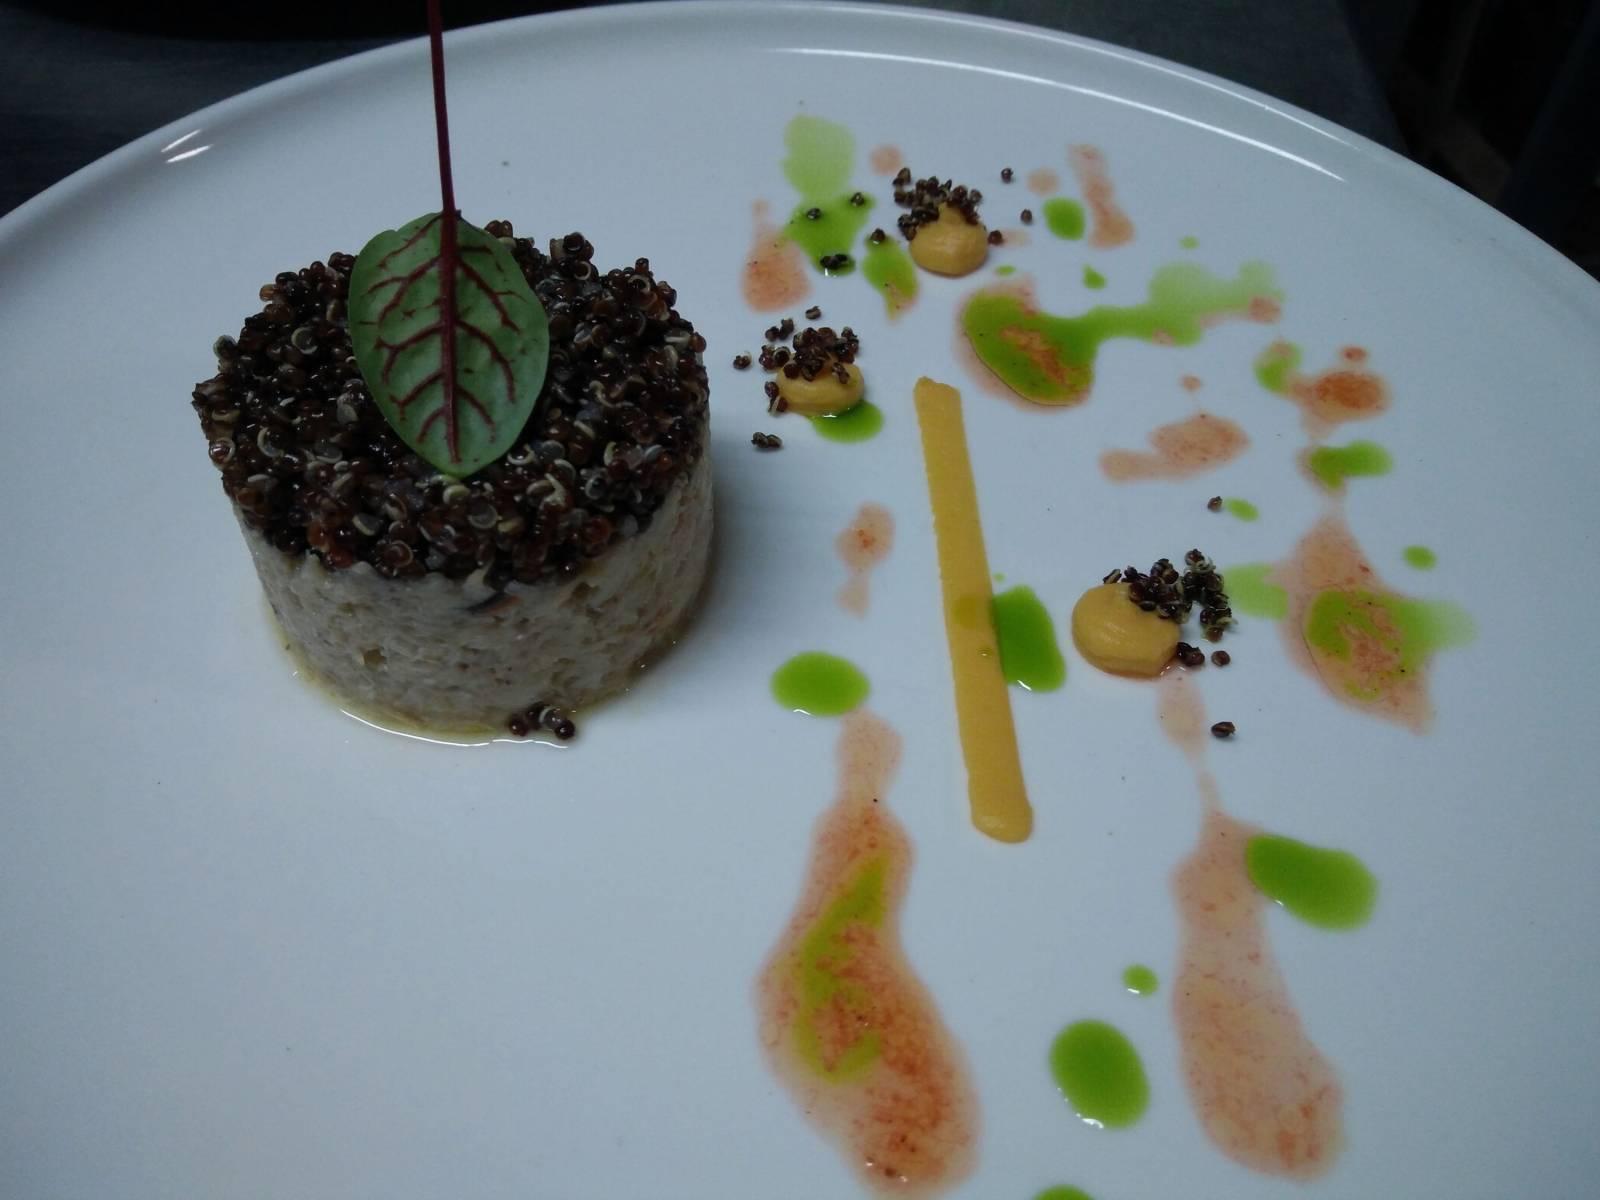 Very Food - Catering - House of Weddings  - 4